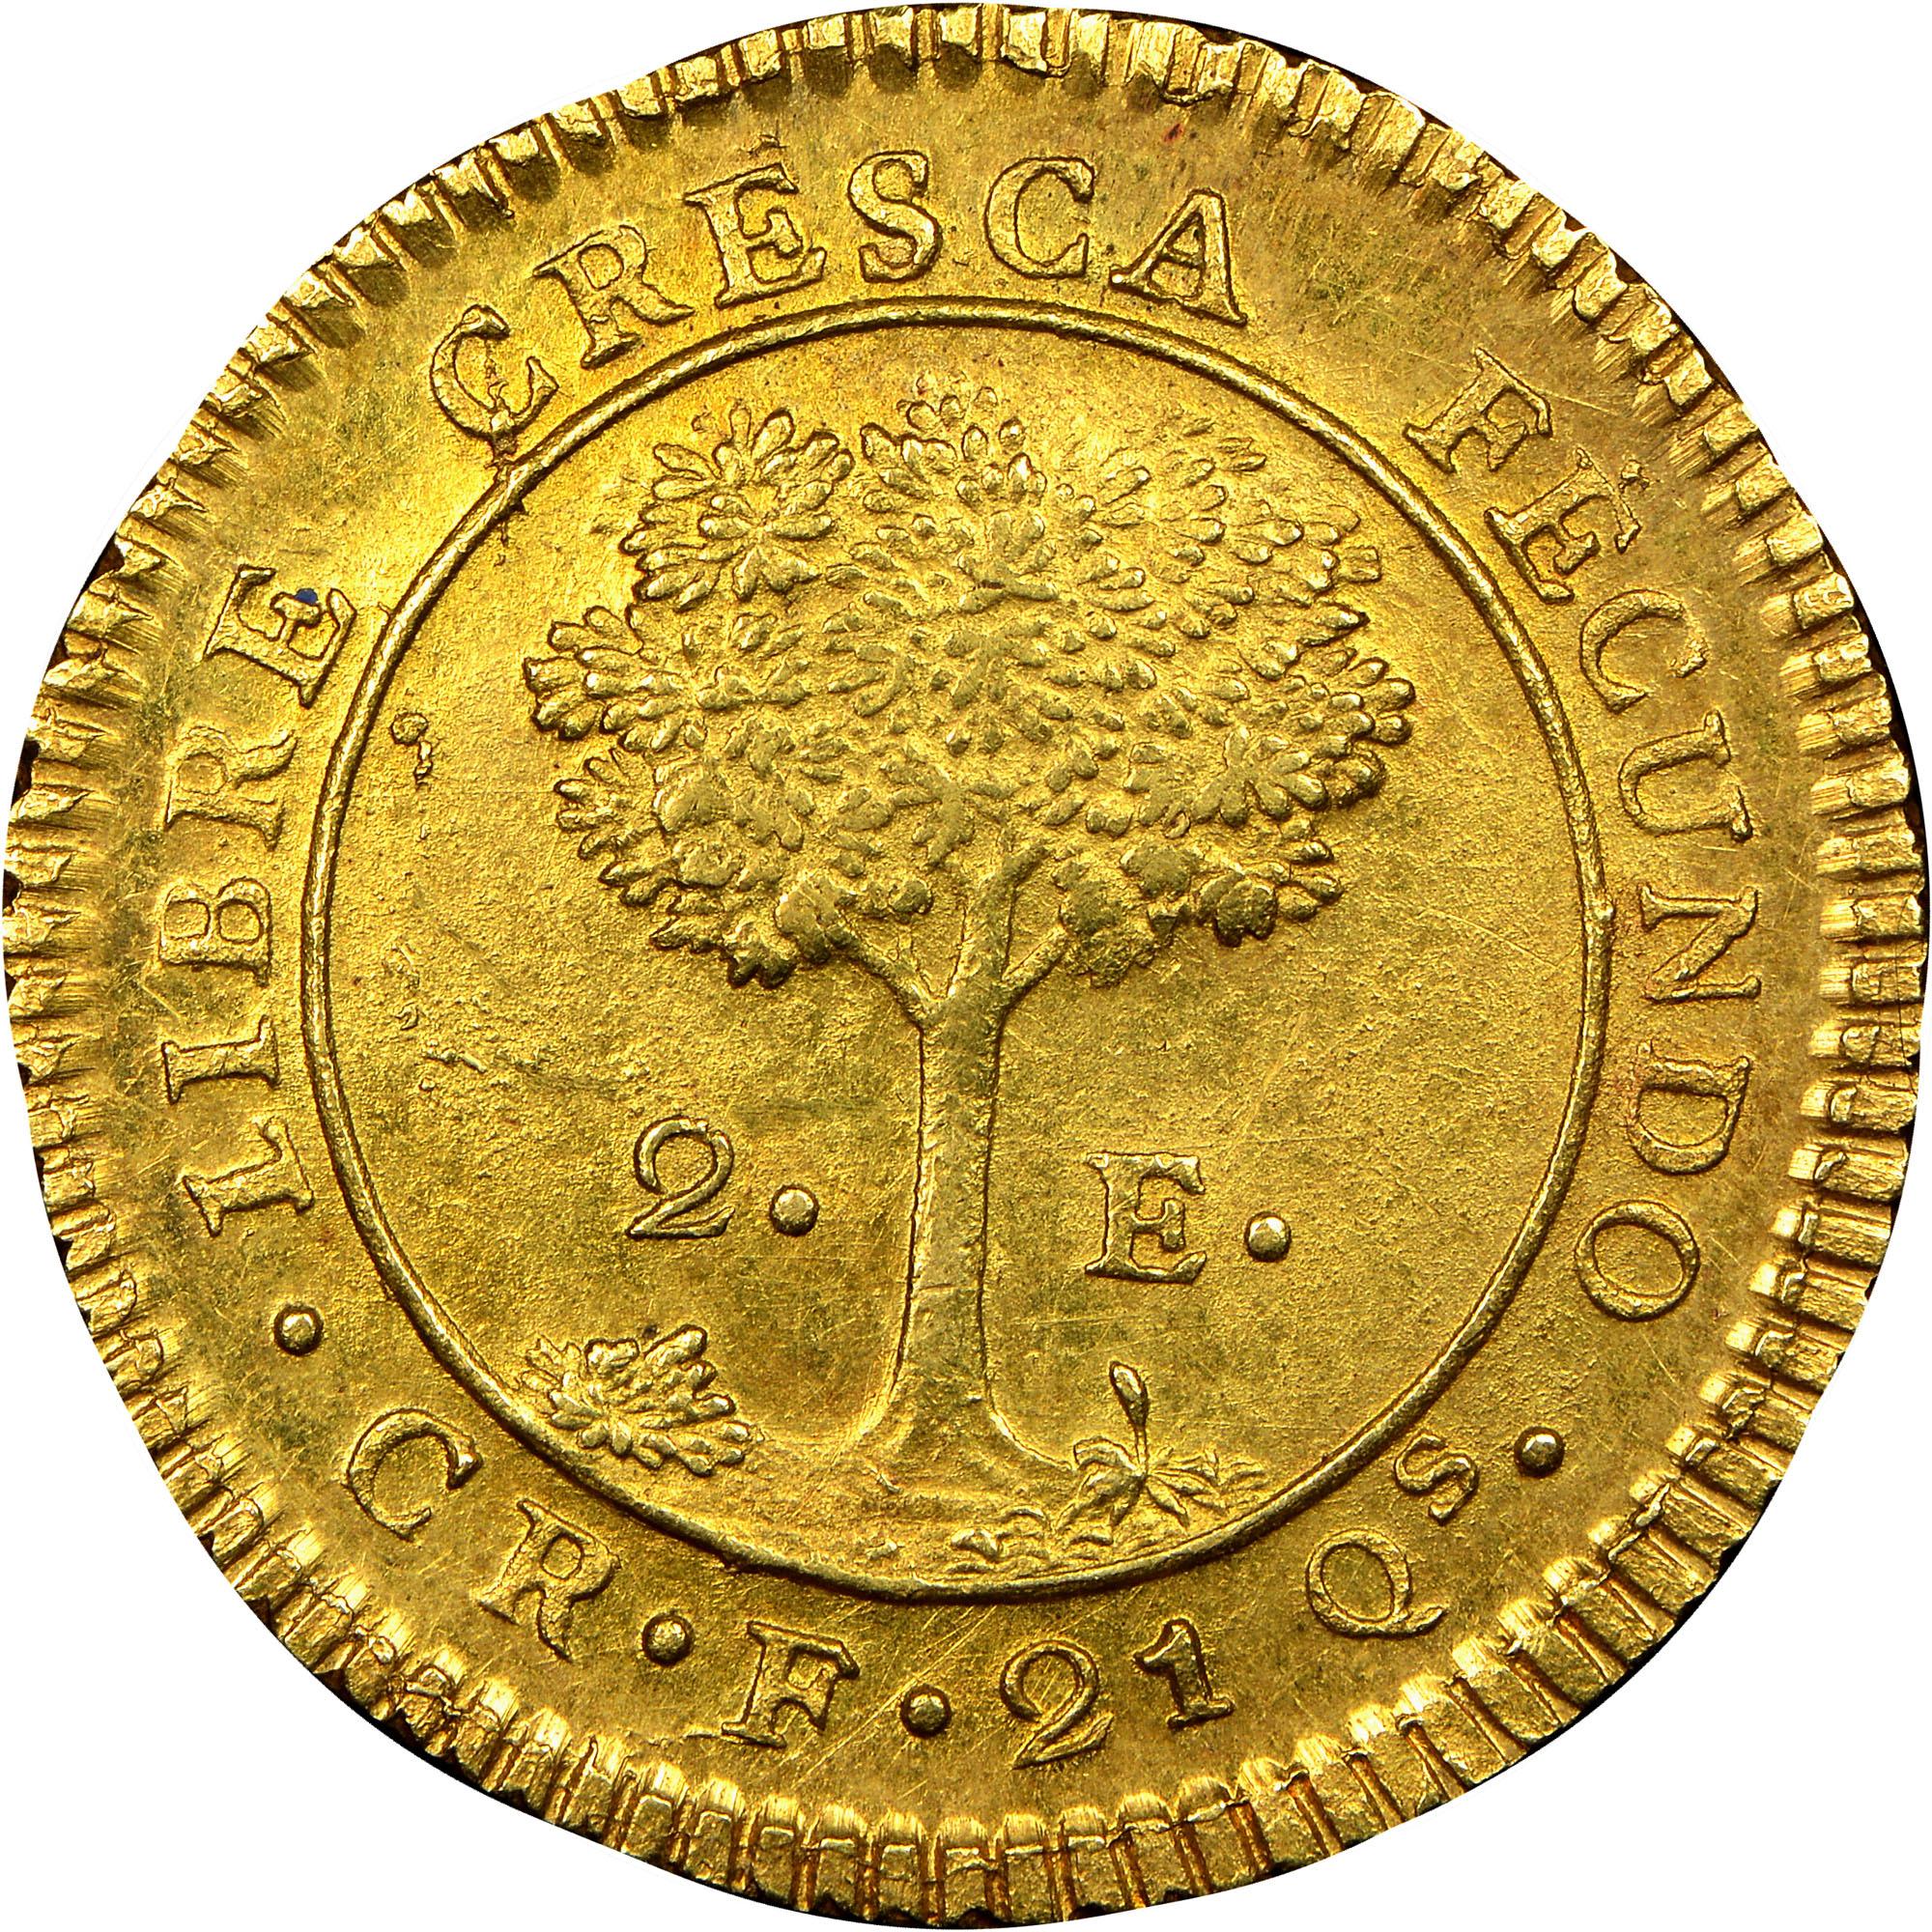 1828-1850 Central American Republic 2 Escudos reverse